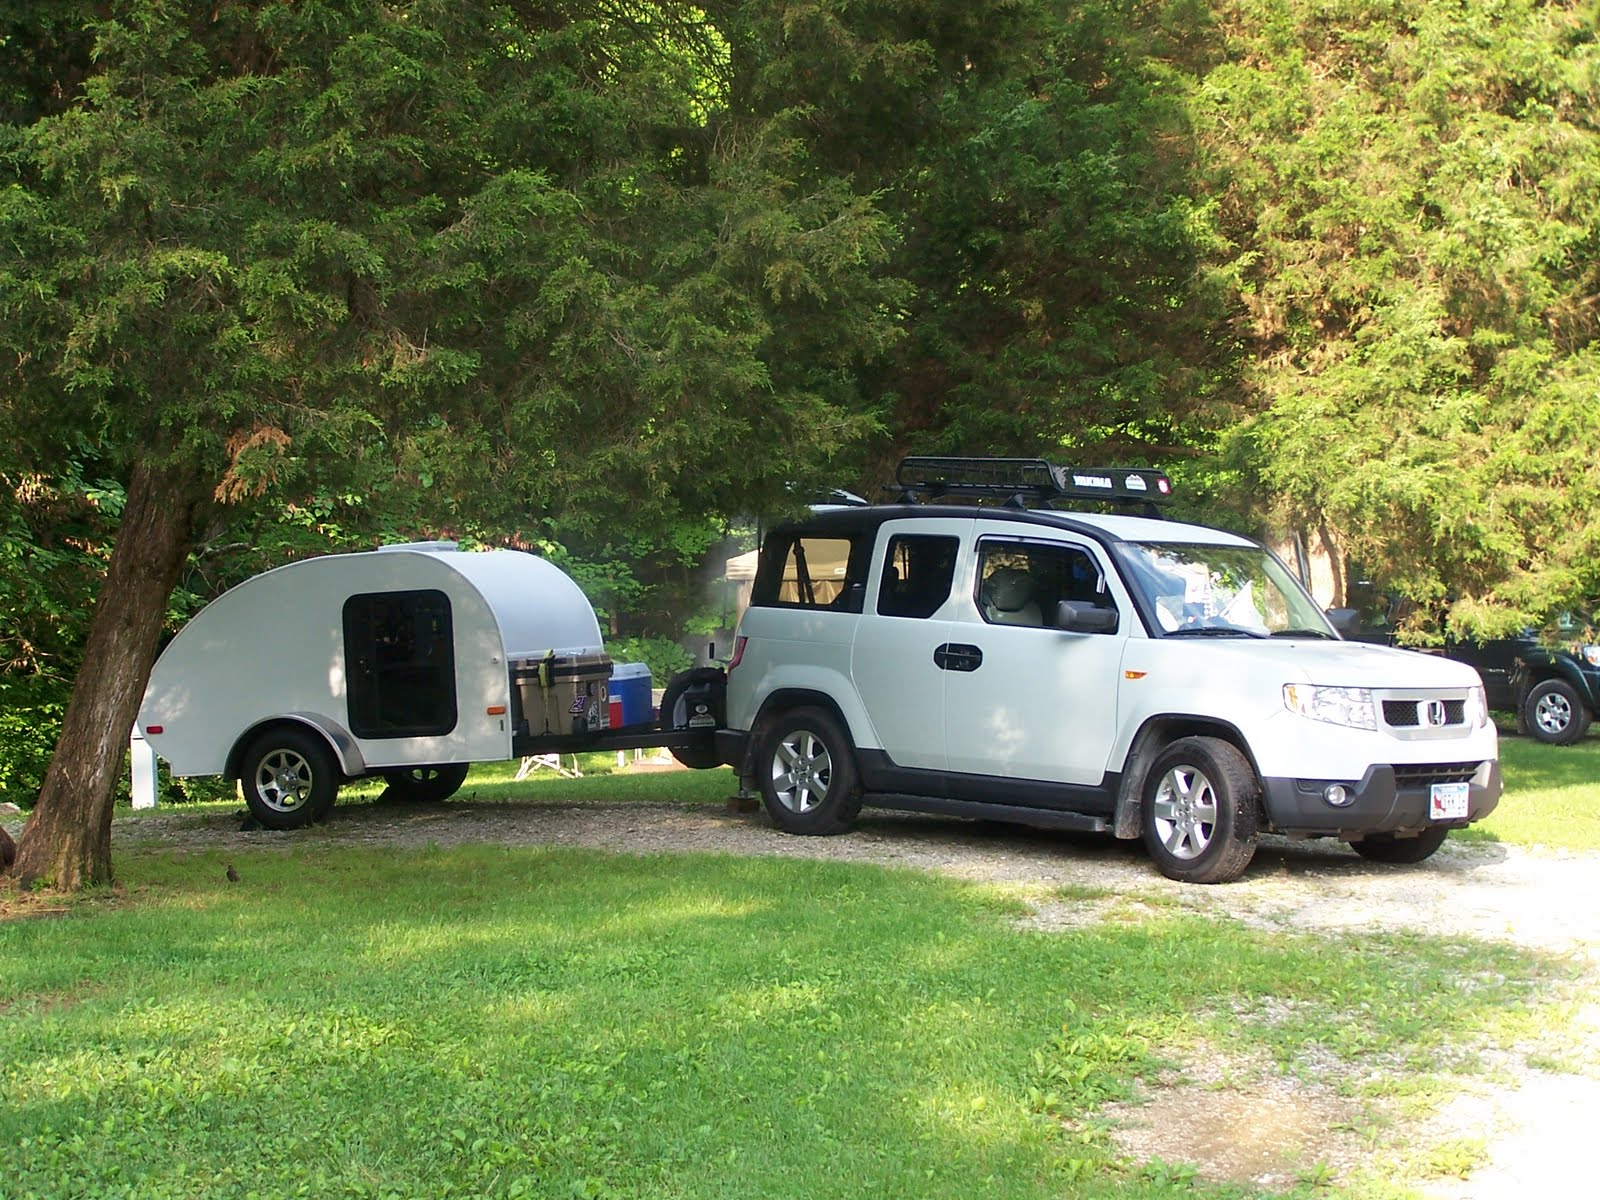 Alan Amp Carie39s Blog 2010 05 22 Teardrop Amp Tiny Trailer Rally